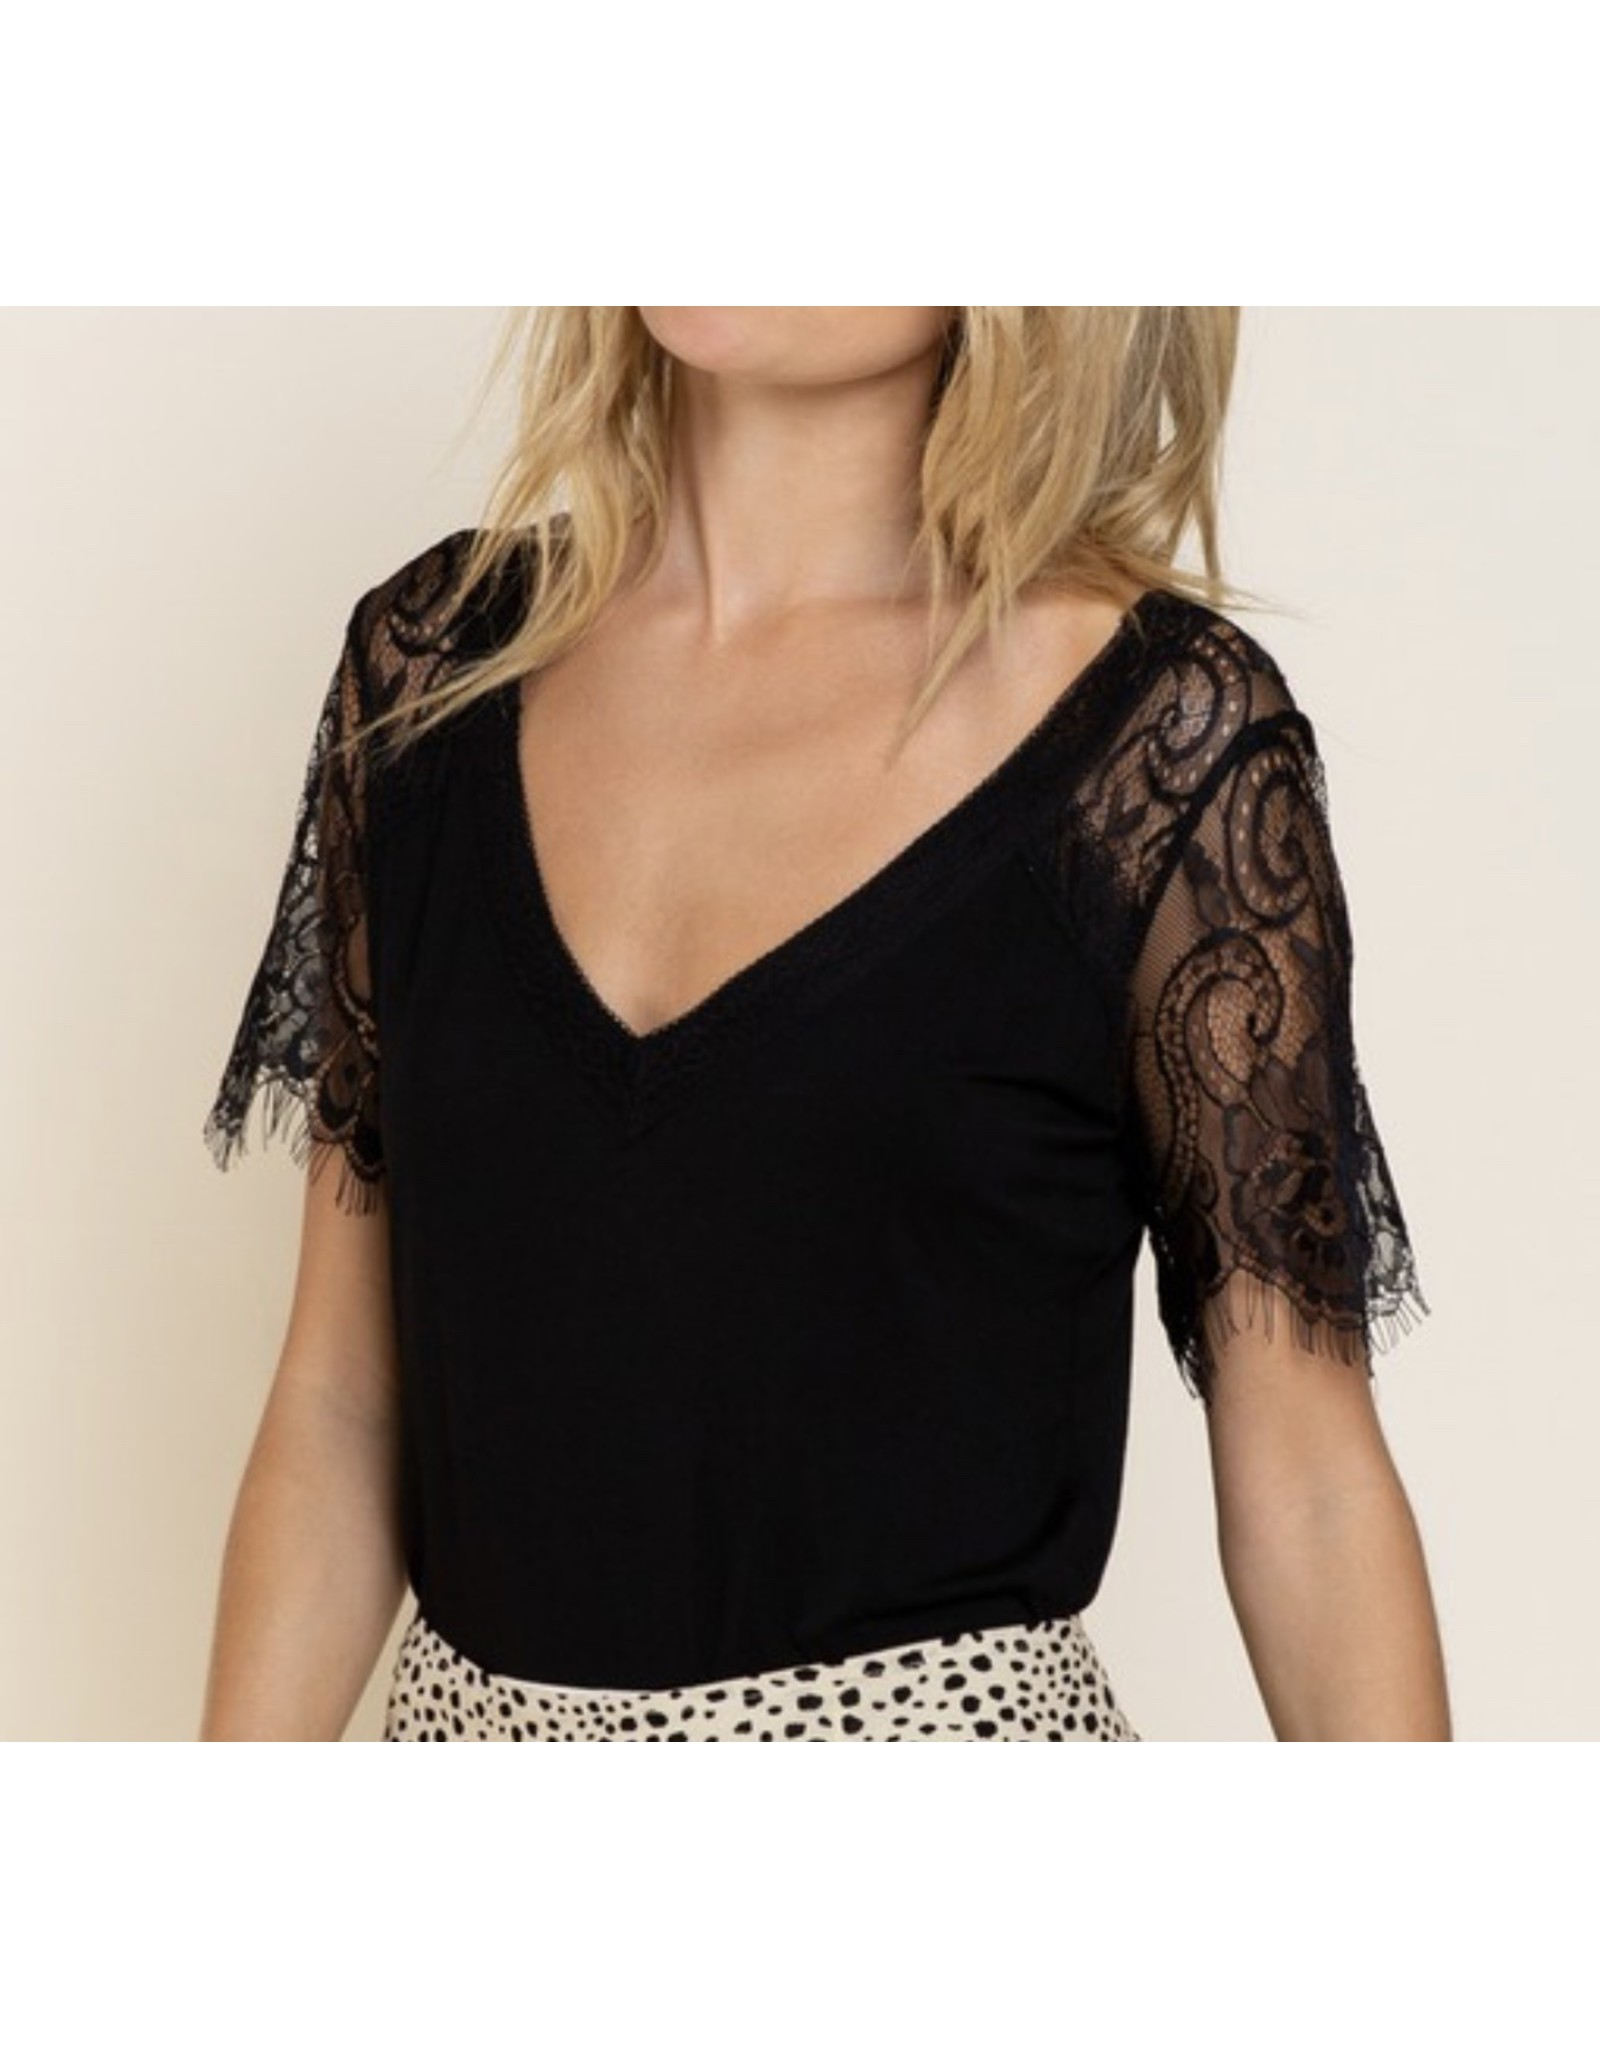 Lace Sleeves Tee - Black